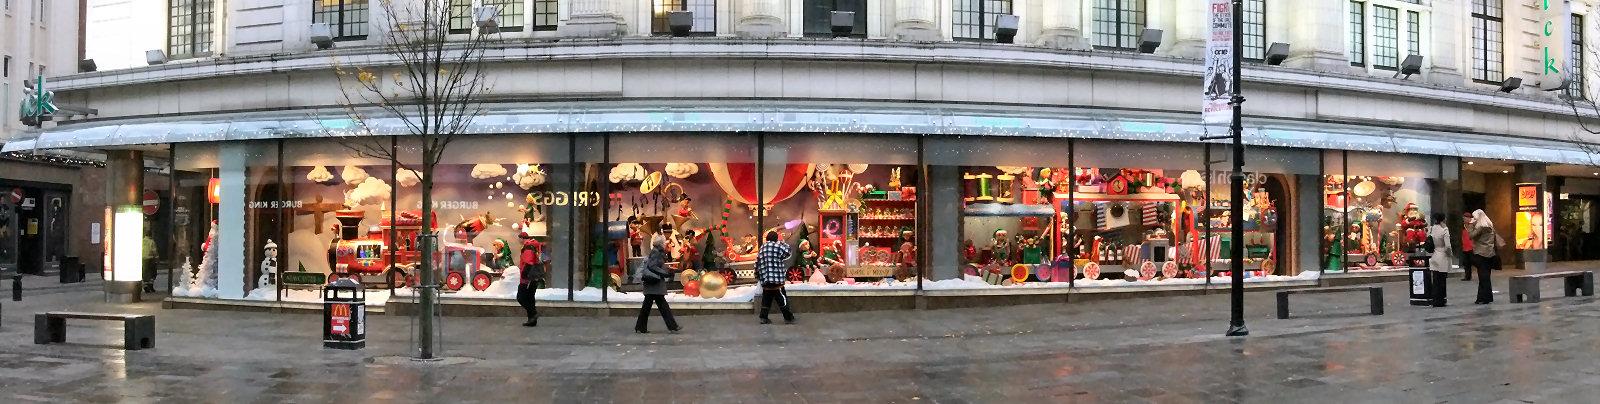 Photographs Of Newcastle: Fenwicks Christmas Window